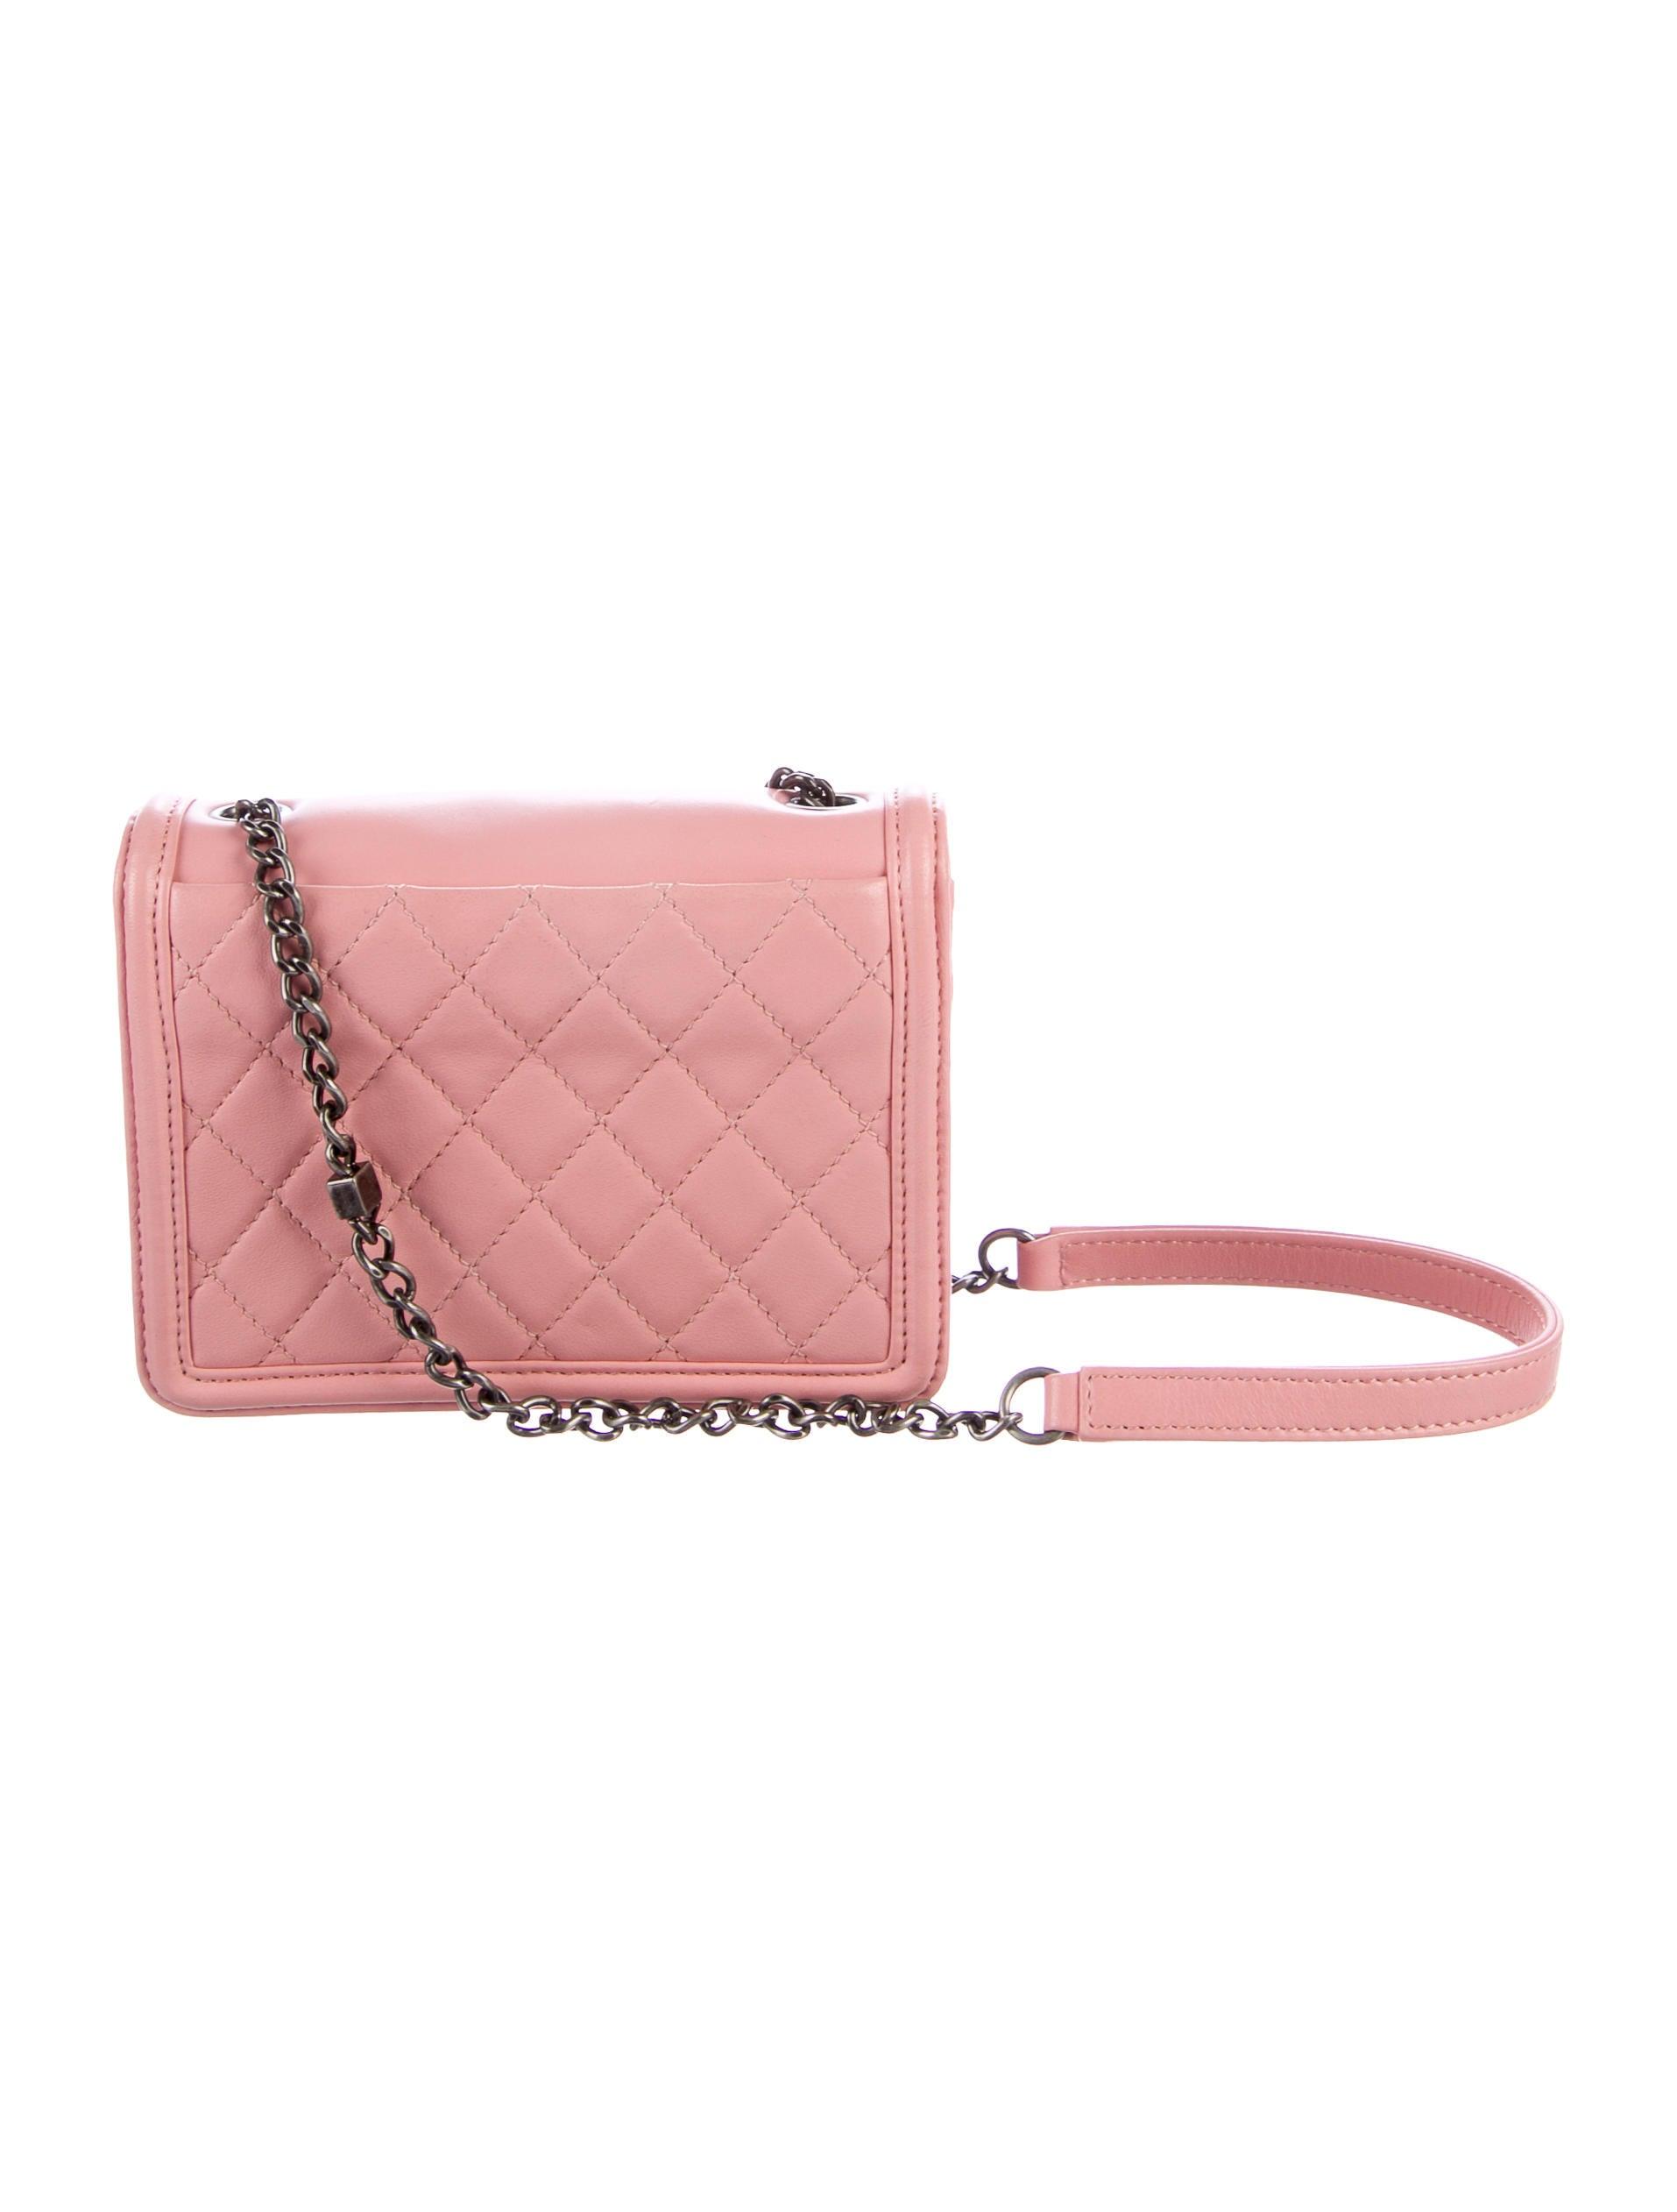 Chanel Boy Brick Flap Bag Handbags Cha205361 The